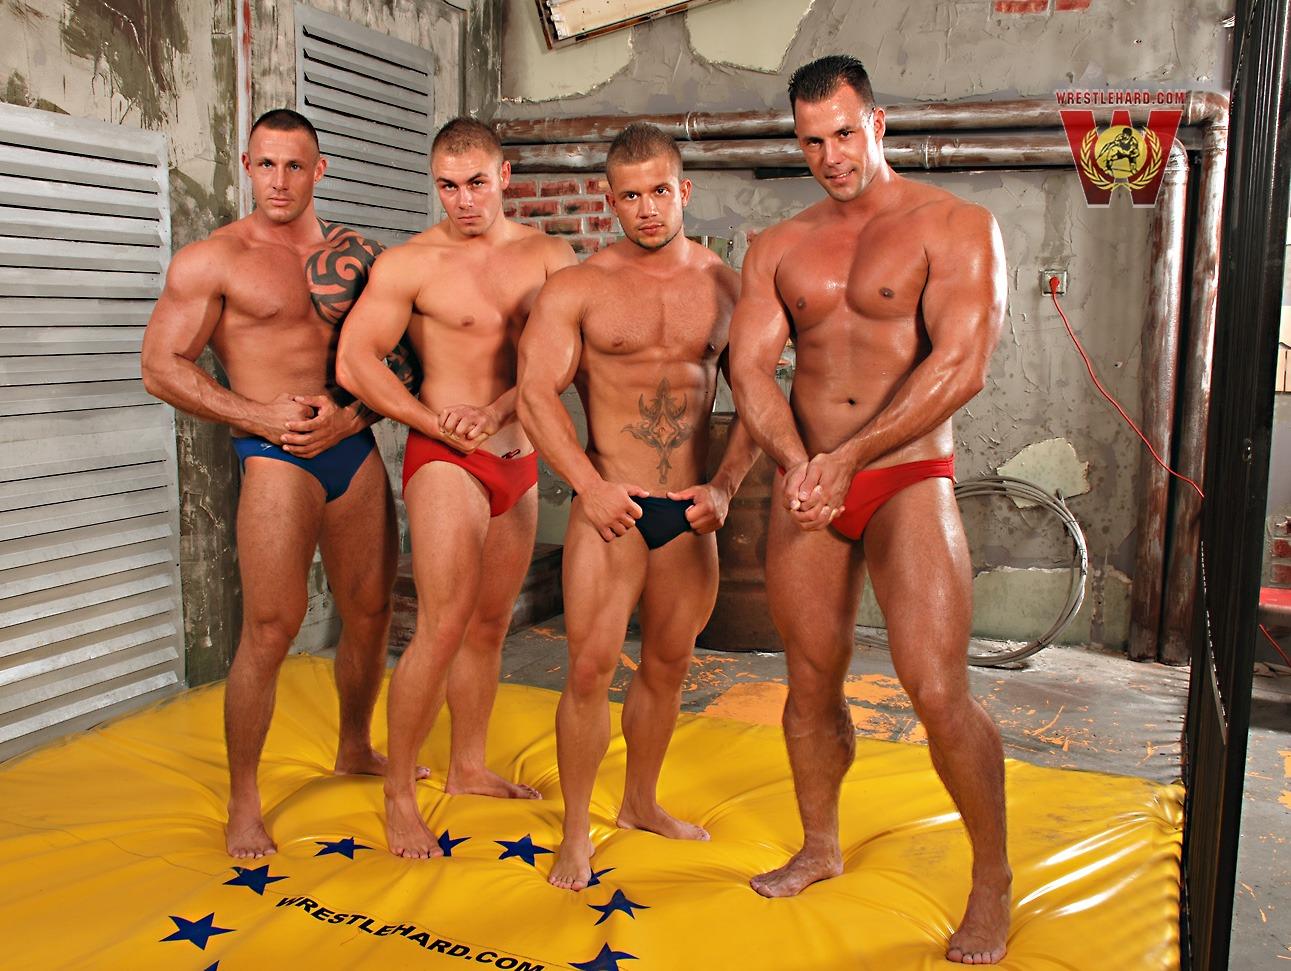 nude wresling blog